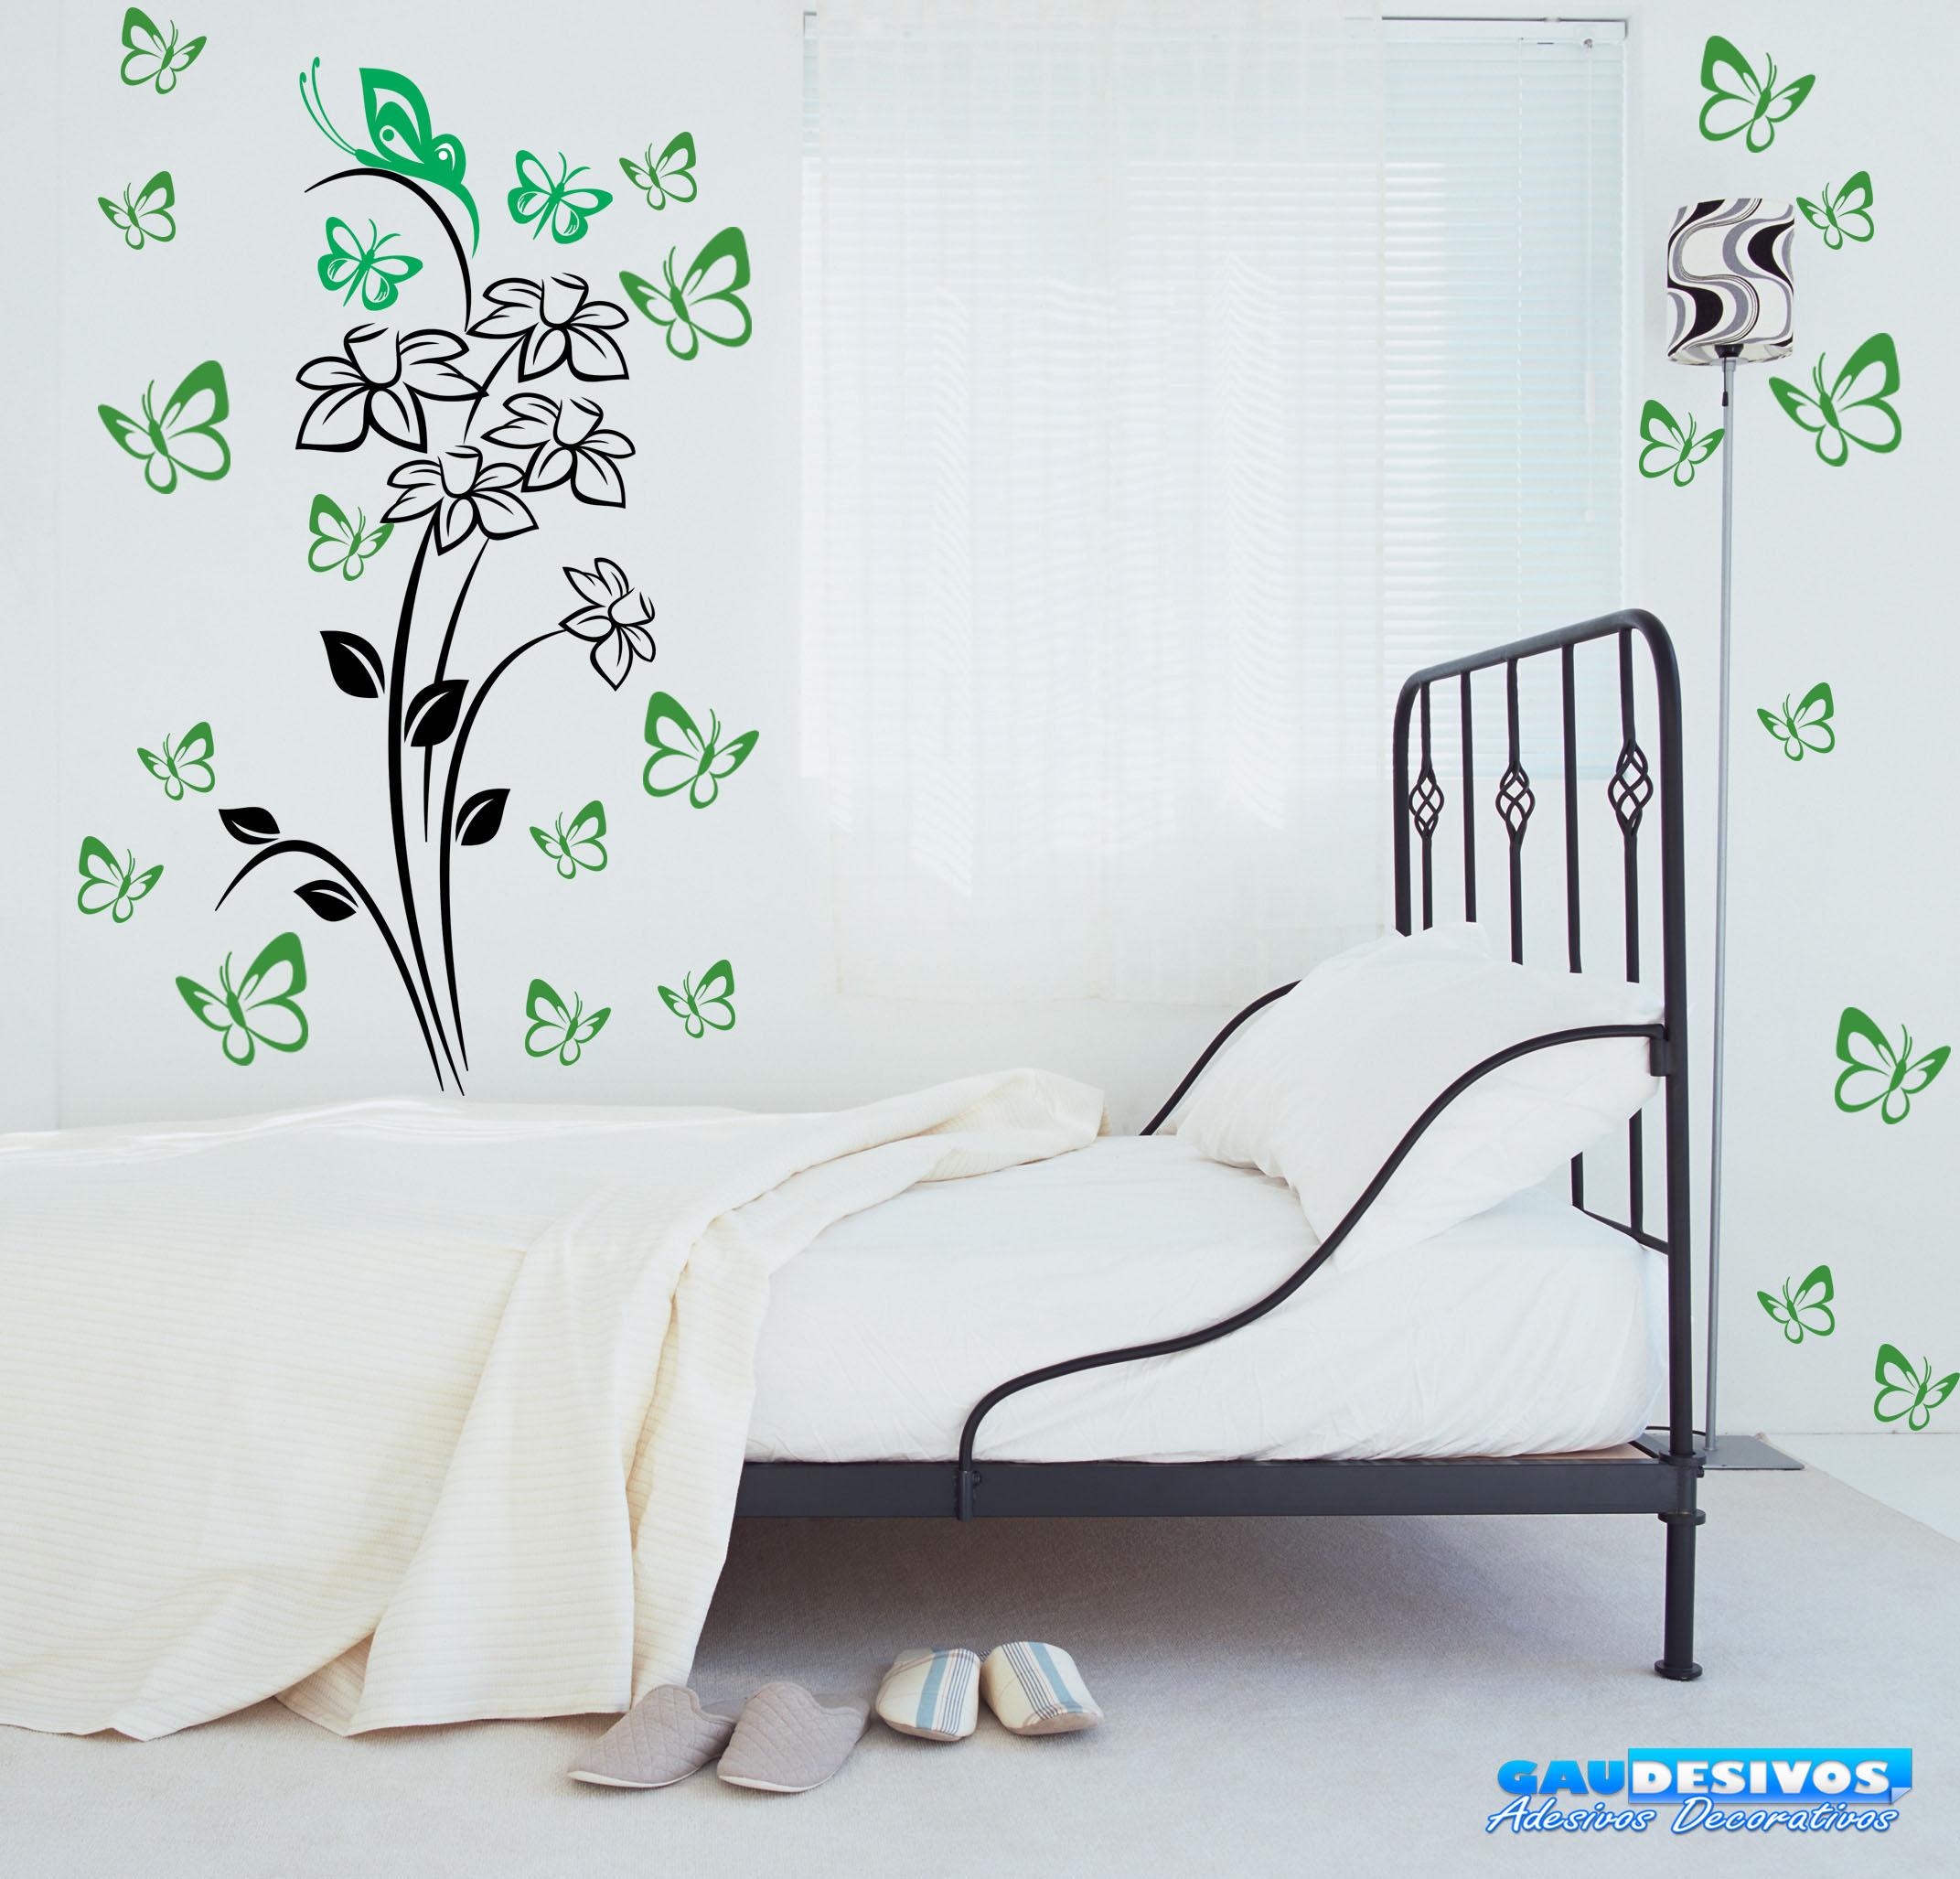 Aparador Verde Envejecido ~ Combo Adesivo Decorativo de Parede Floral 3 e Kite Borboletas